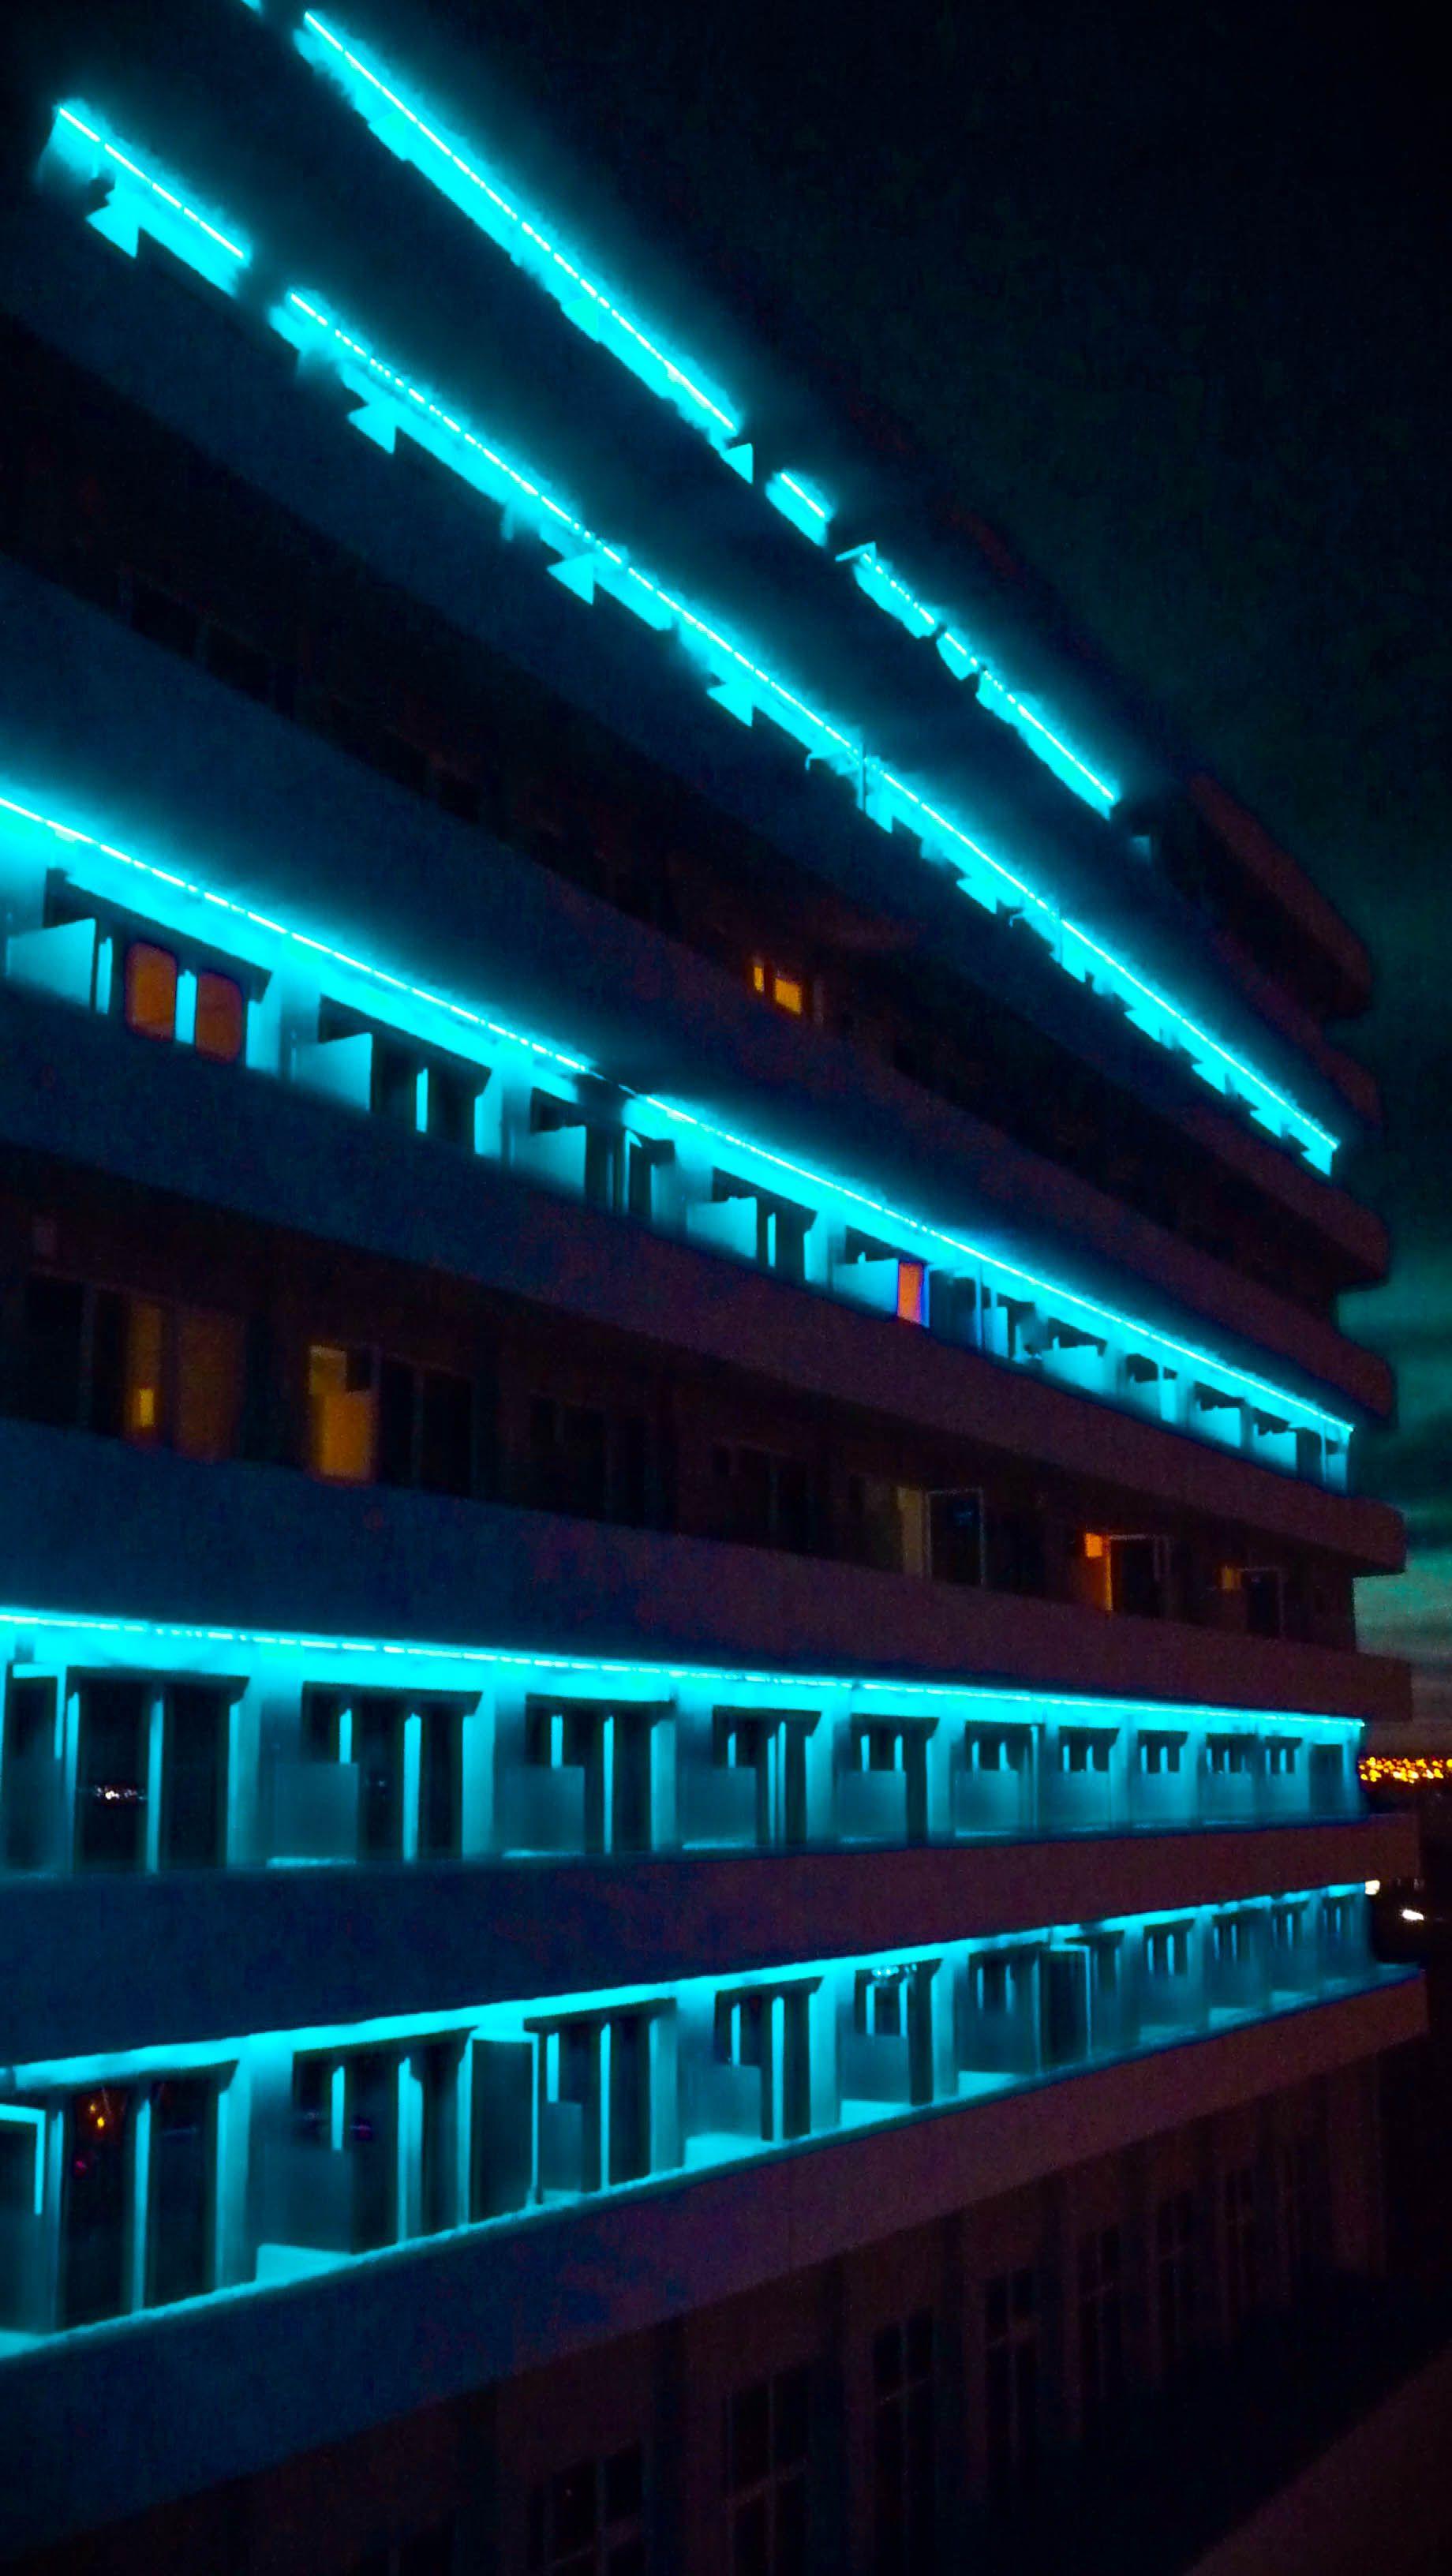 Hotel Rayentray Puerto Madryn Rayentray Hotel Night Lights